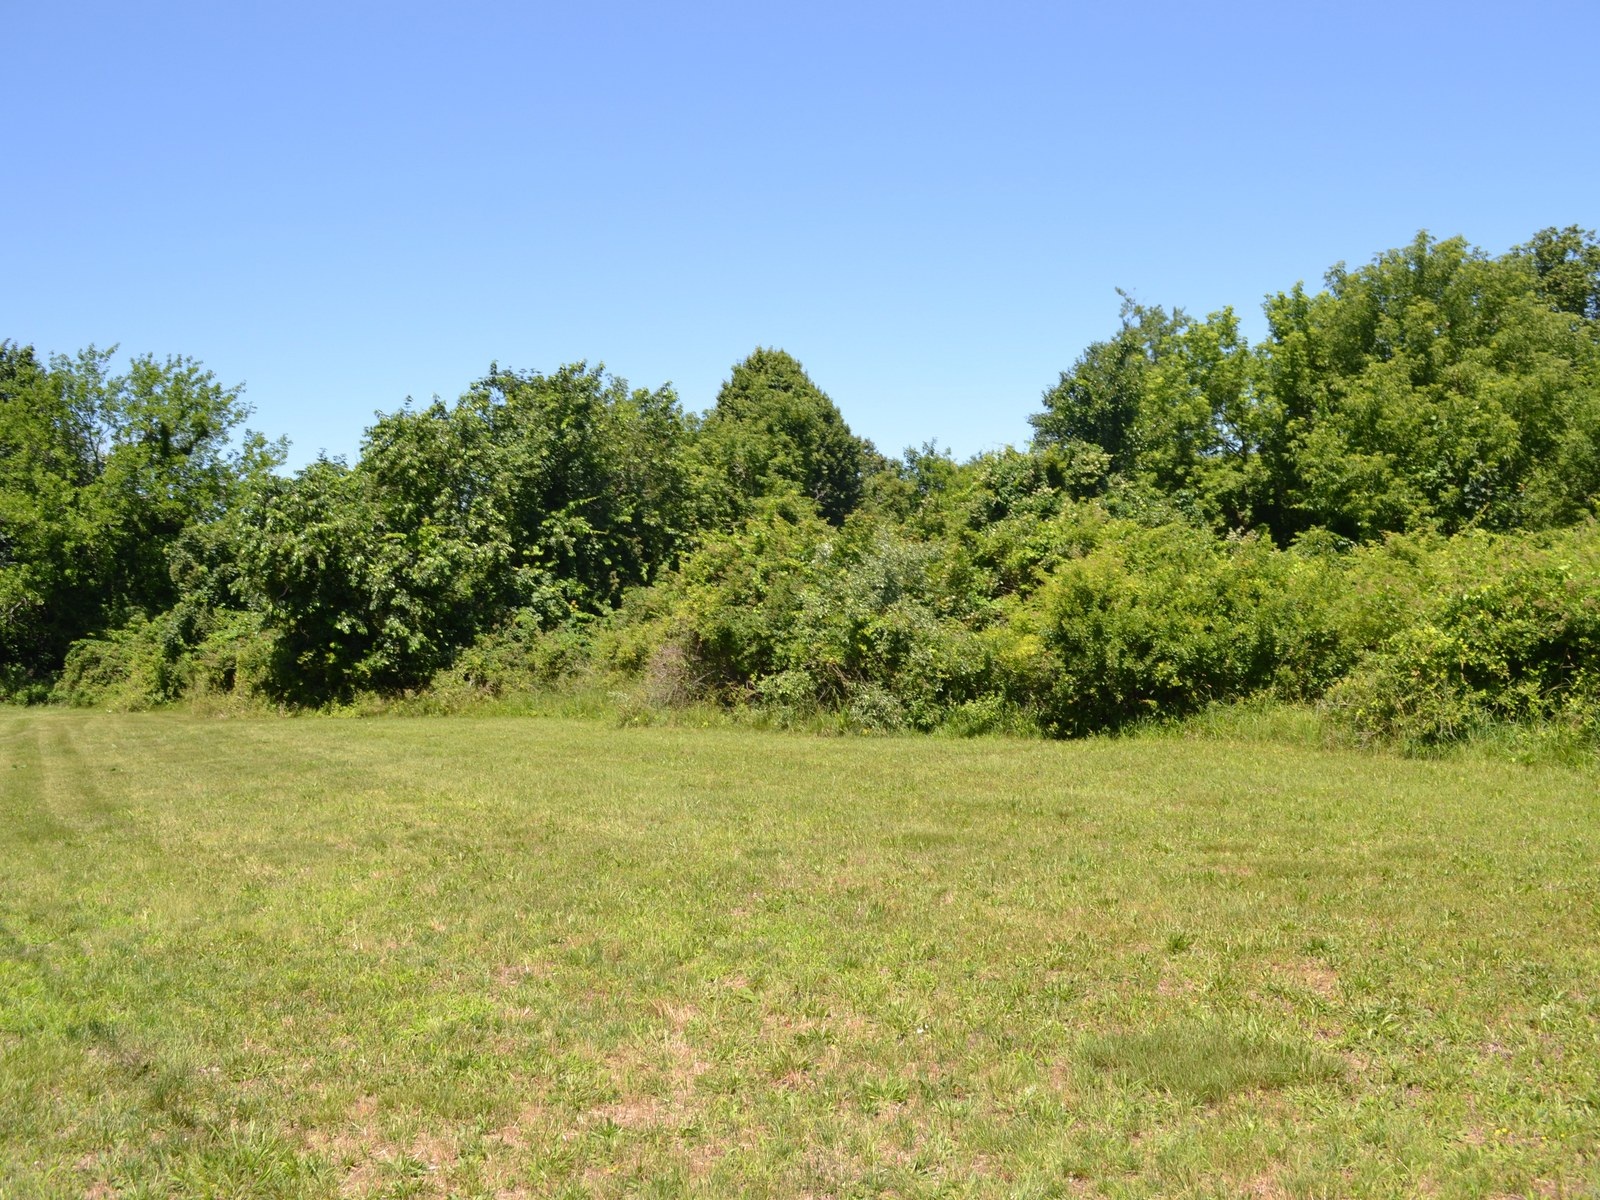 Terreno por un Venta en Land 1080 Ackerly Pond Rd Southold, Nueva York, 11971 Estados Unidos